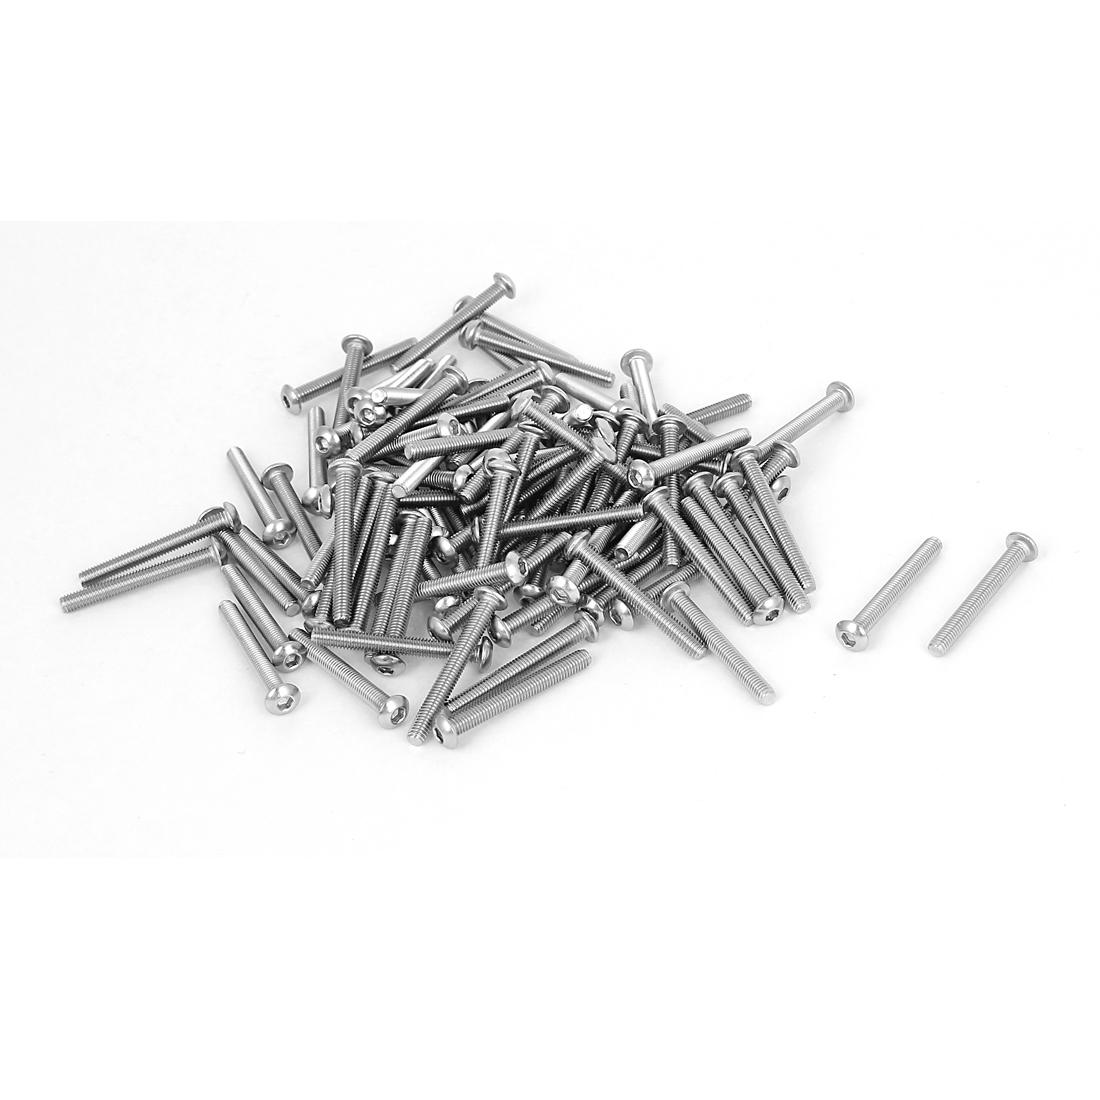 100 Pcs M3x25mm Stainless Steel Button Head Socket Cap Bolts Machine Screws